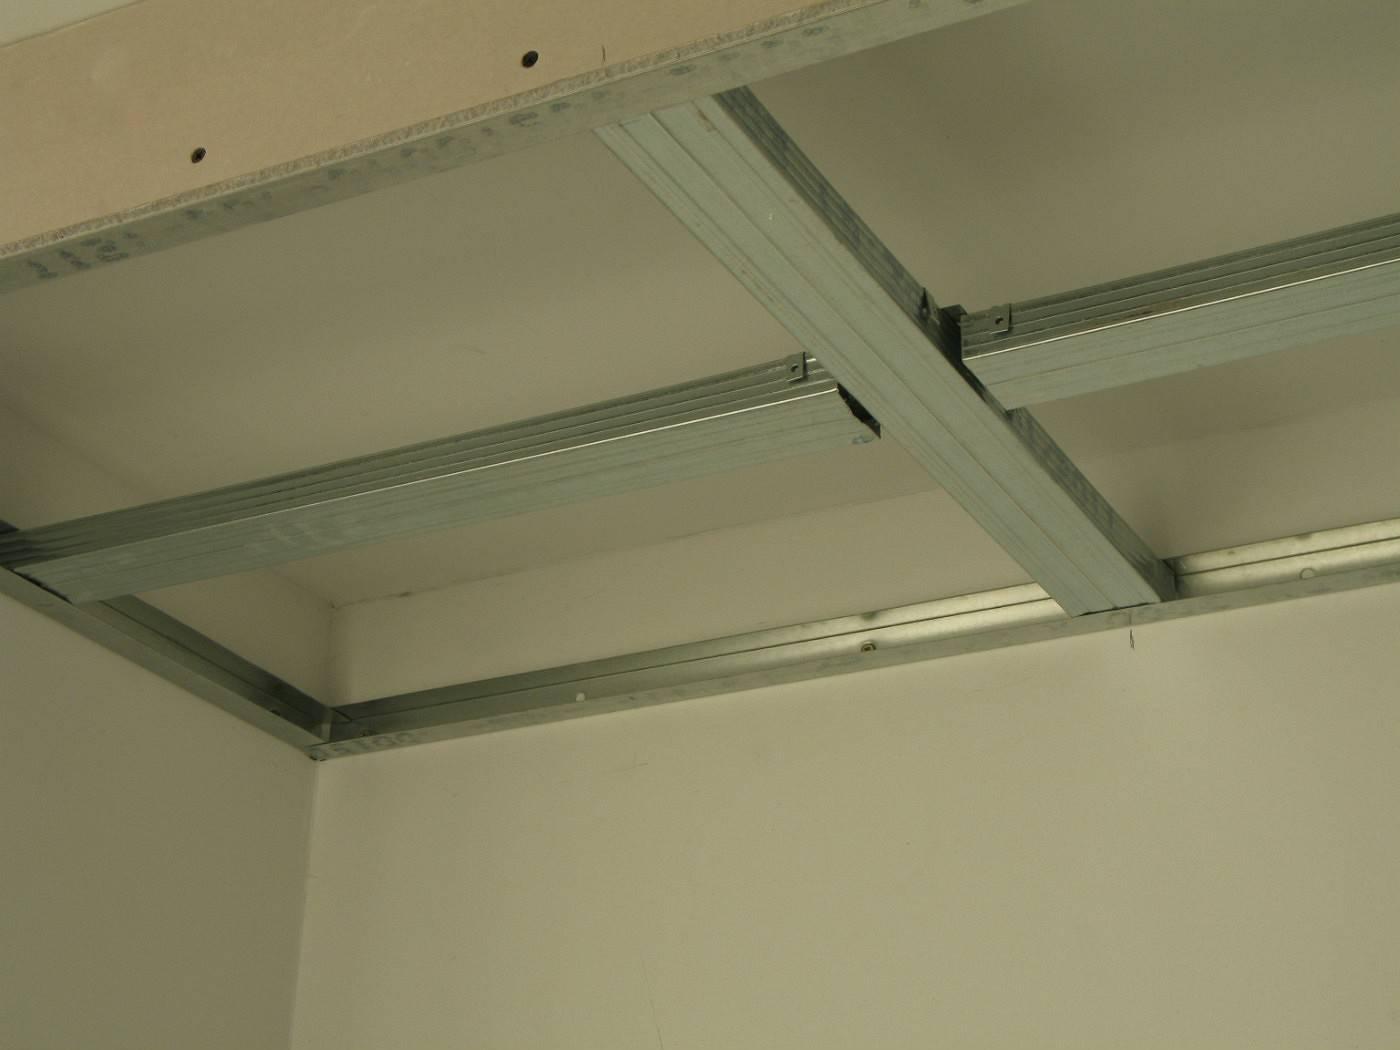 Как крепить гипсокартон к потолку: крепим каркас и листы